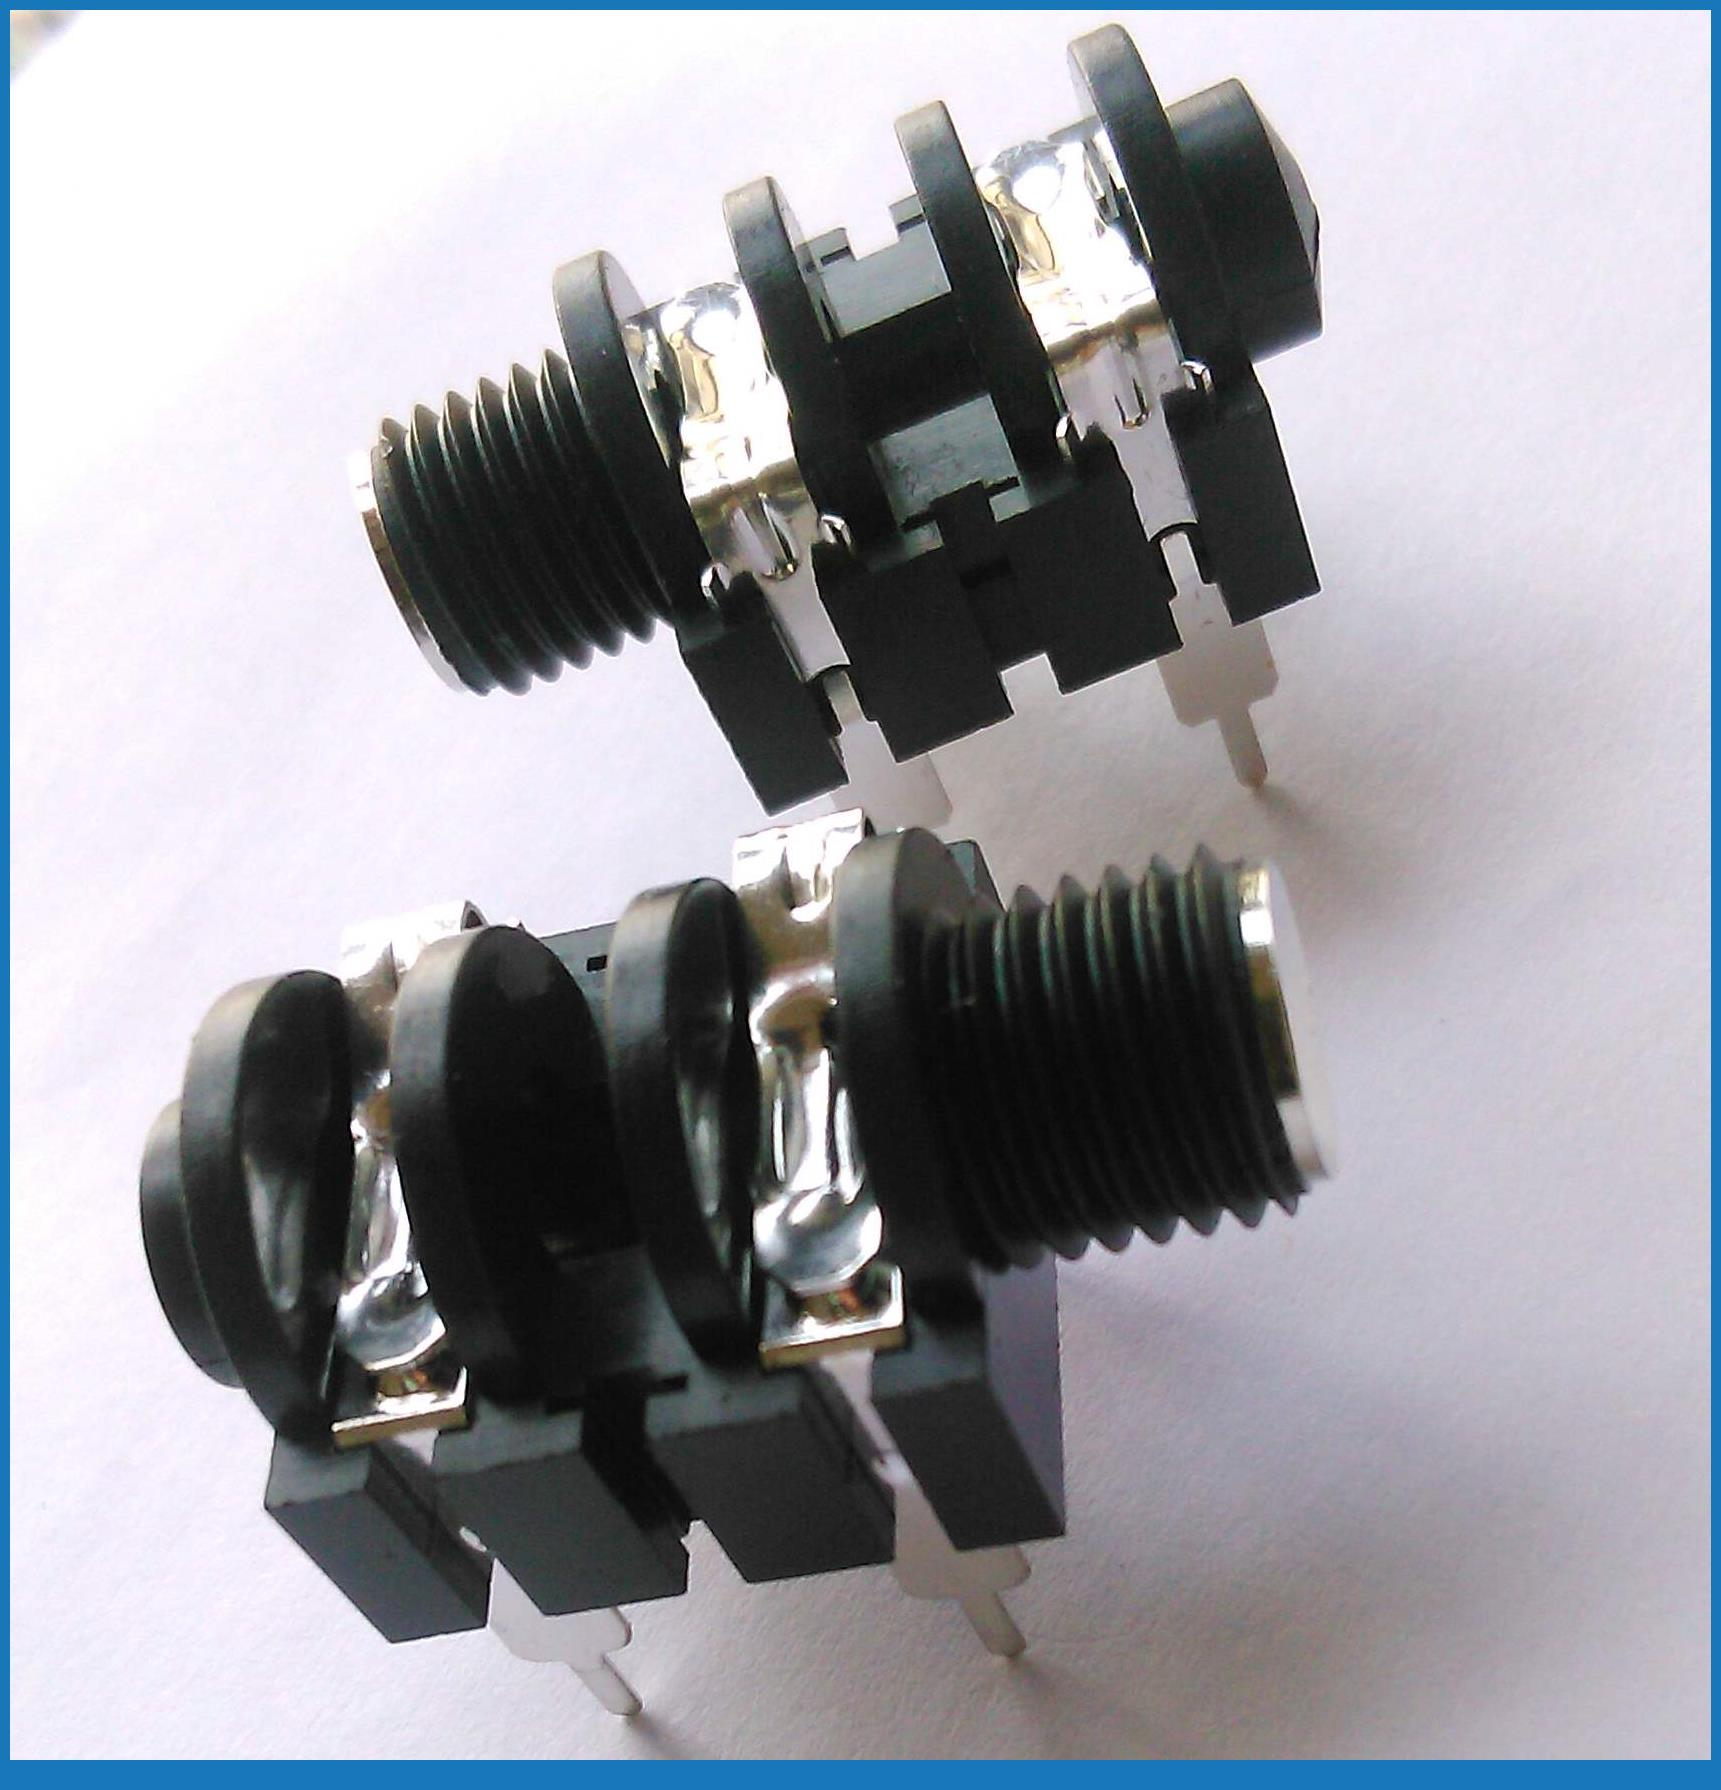 10pcs 6 35mm mono headphone jack microphone 1 4 panel wiring socket amplifiers 1 4 6 35mm mono jack socket panel in connectors from lights lighting on  [ 1721 x 1790 Pixel ]